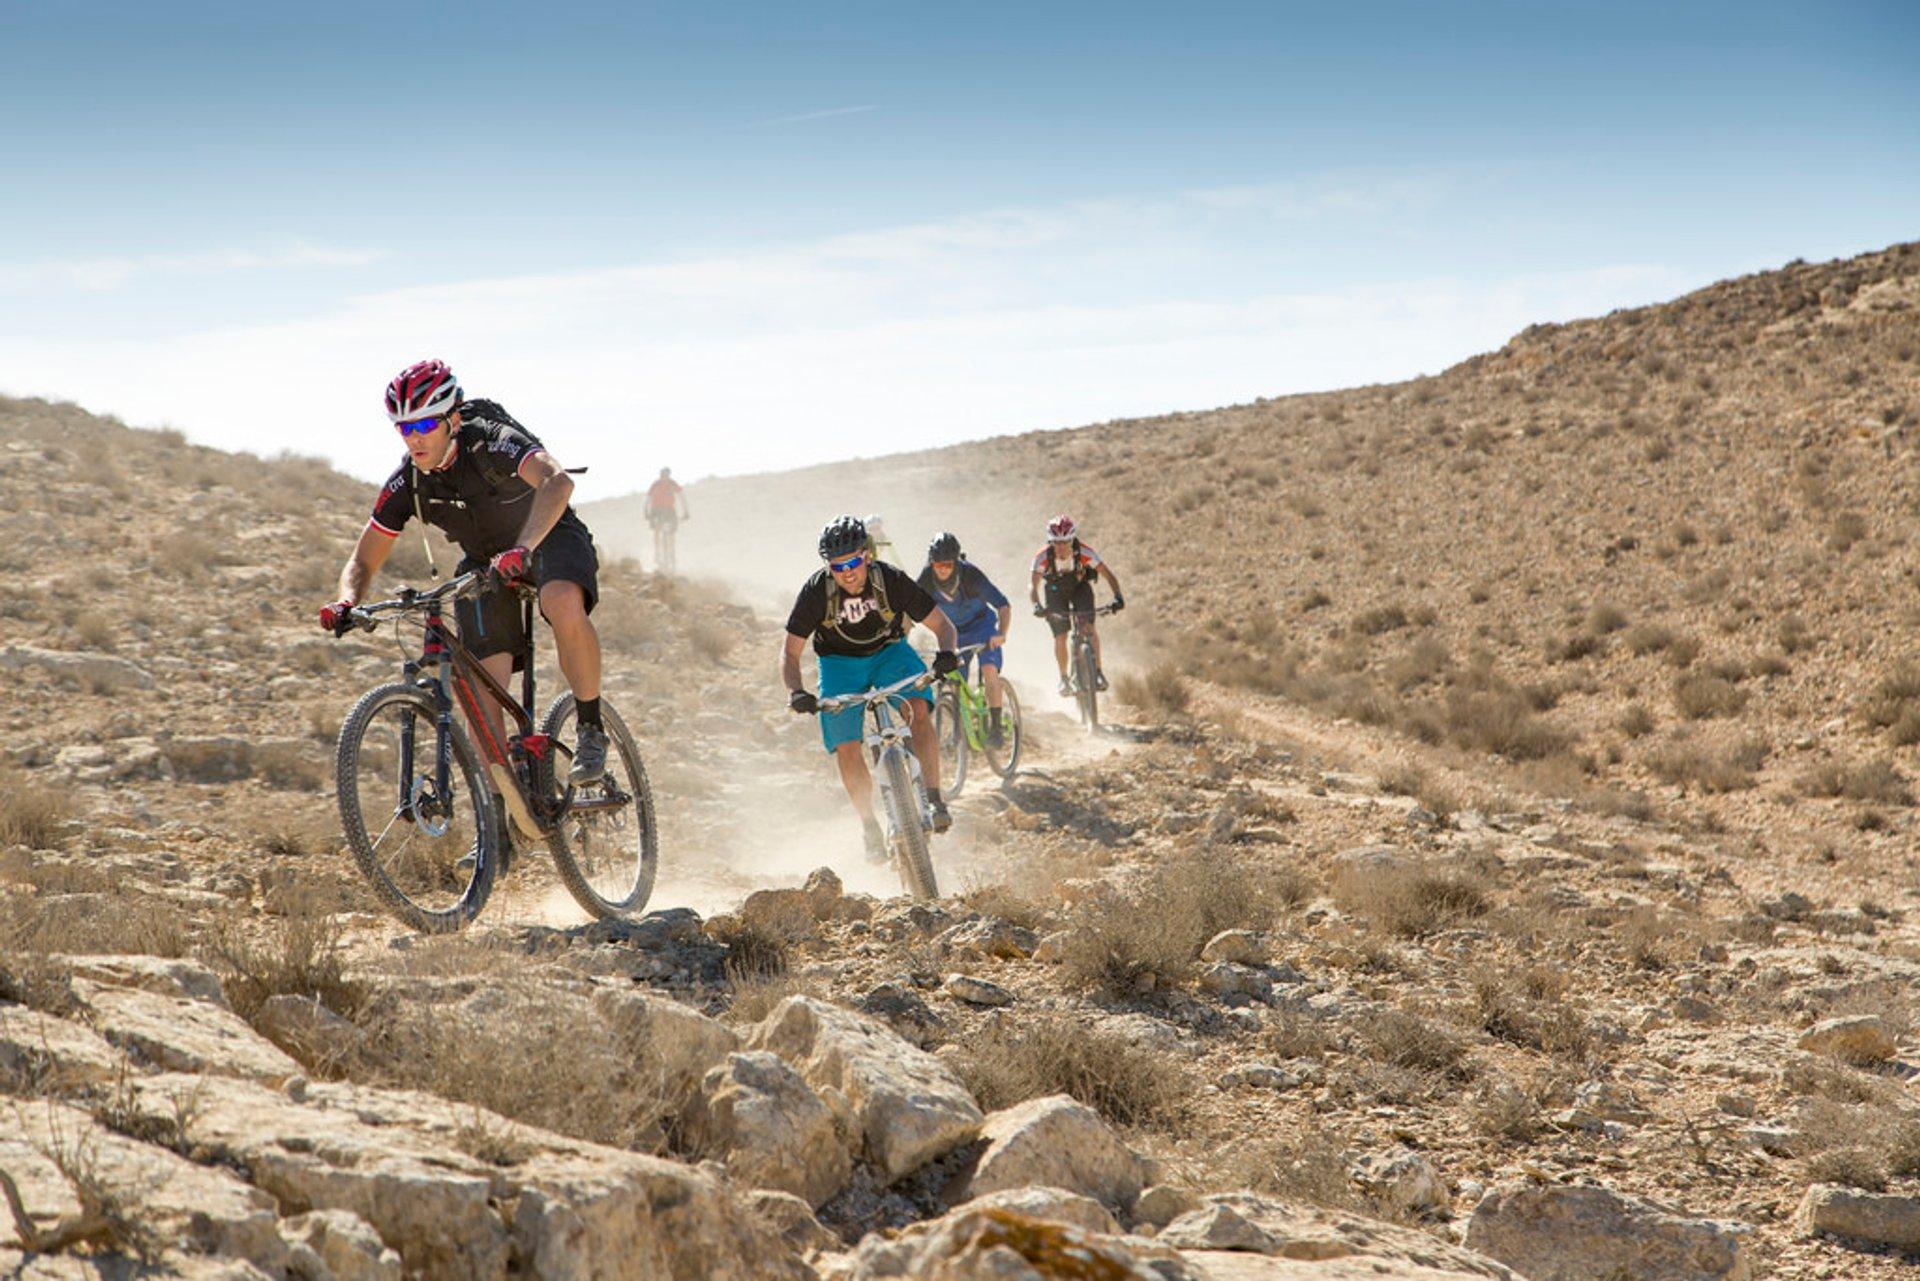 Bike riding in Negev–Arava region 2019